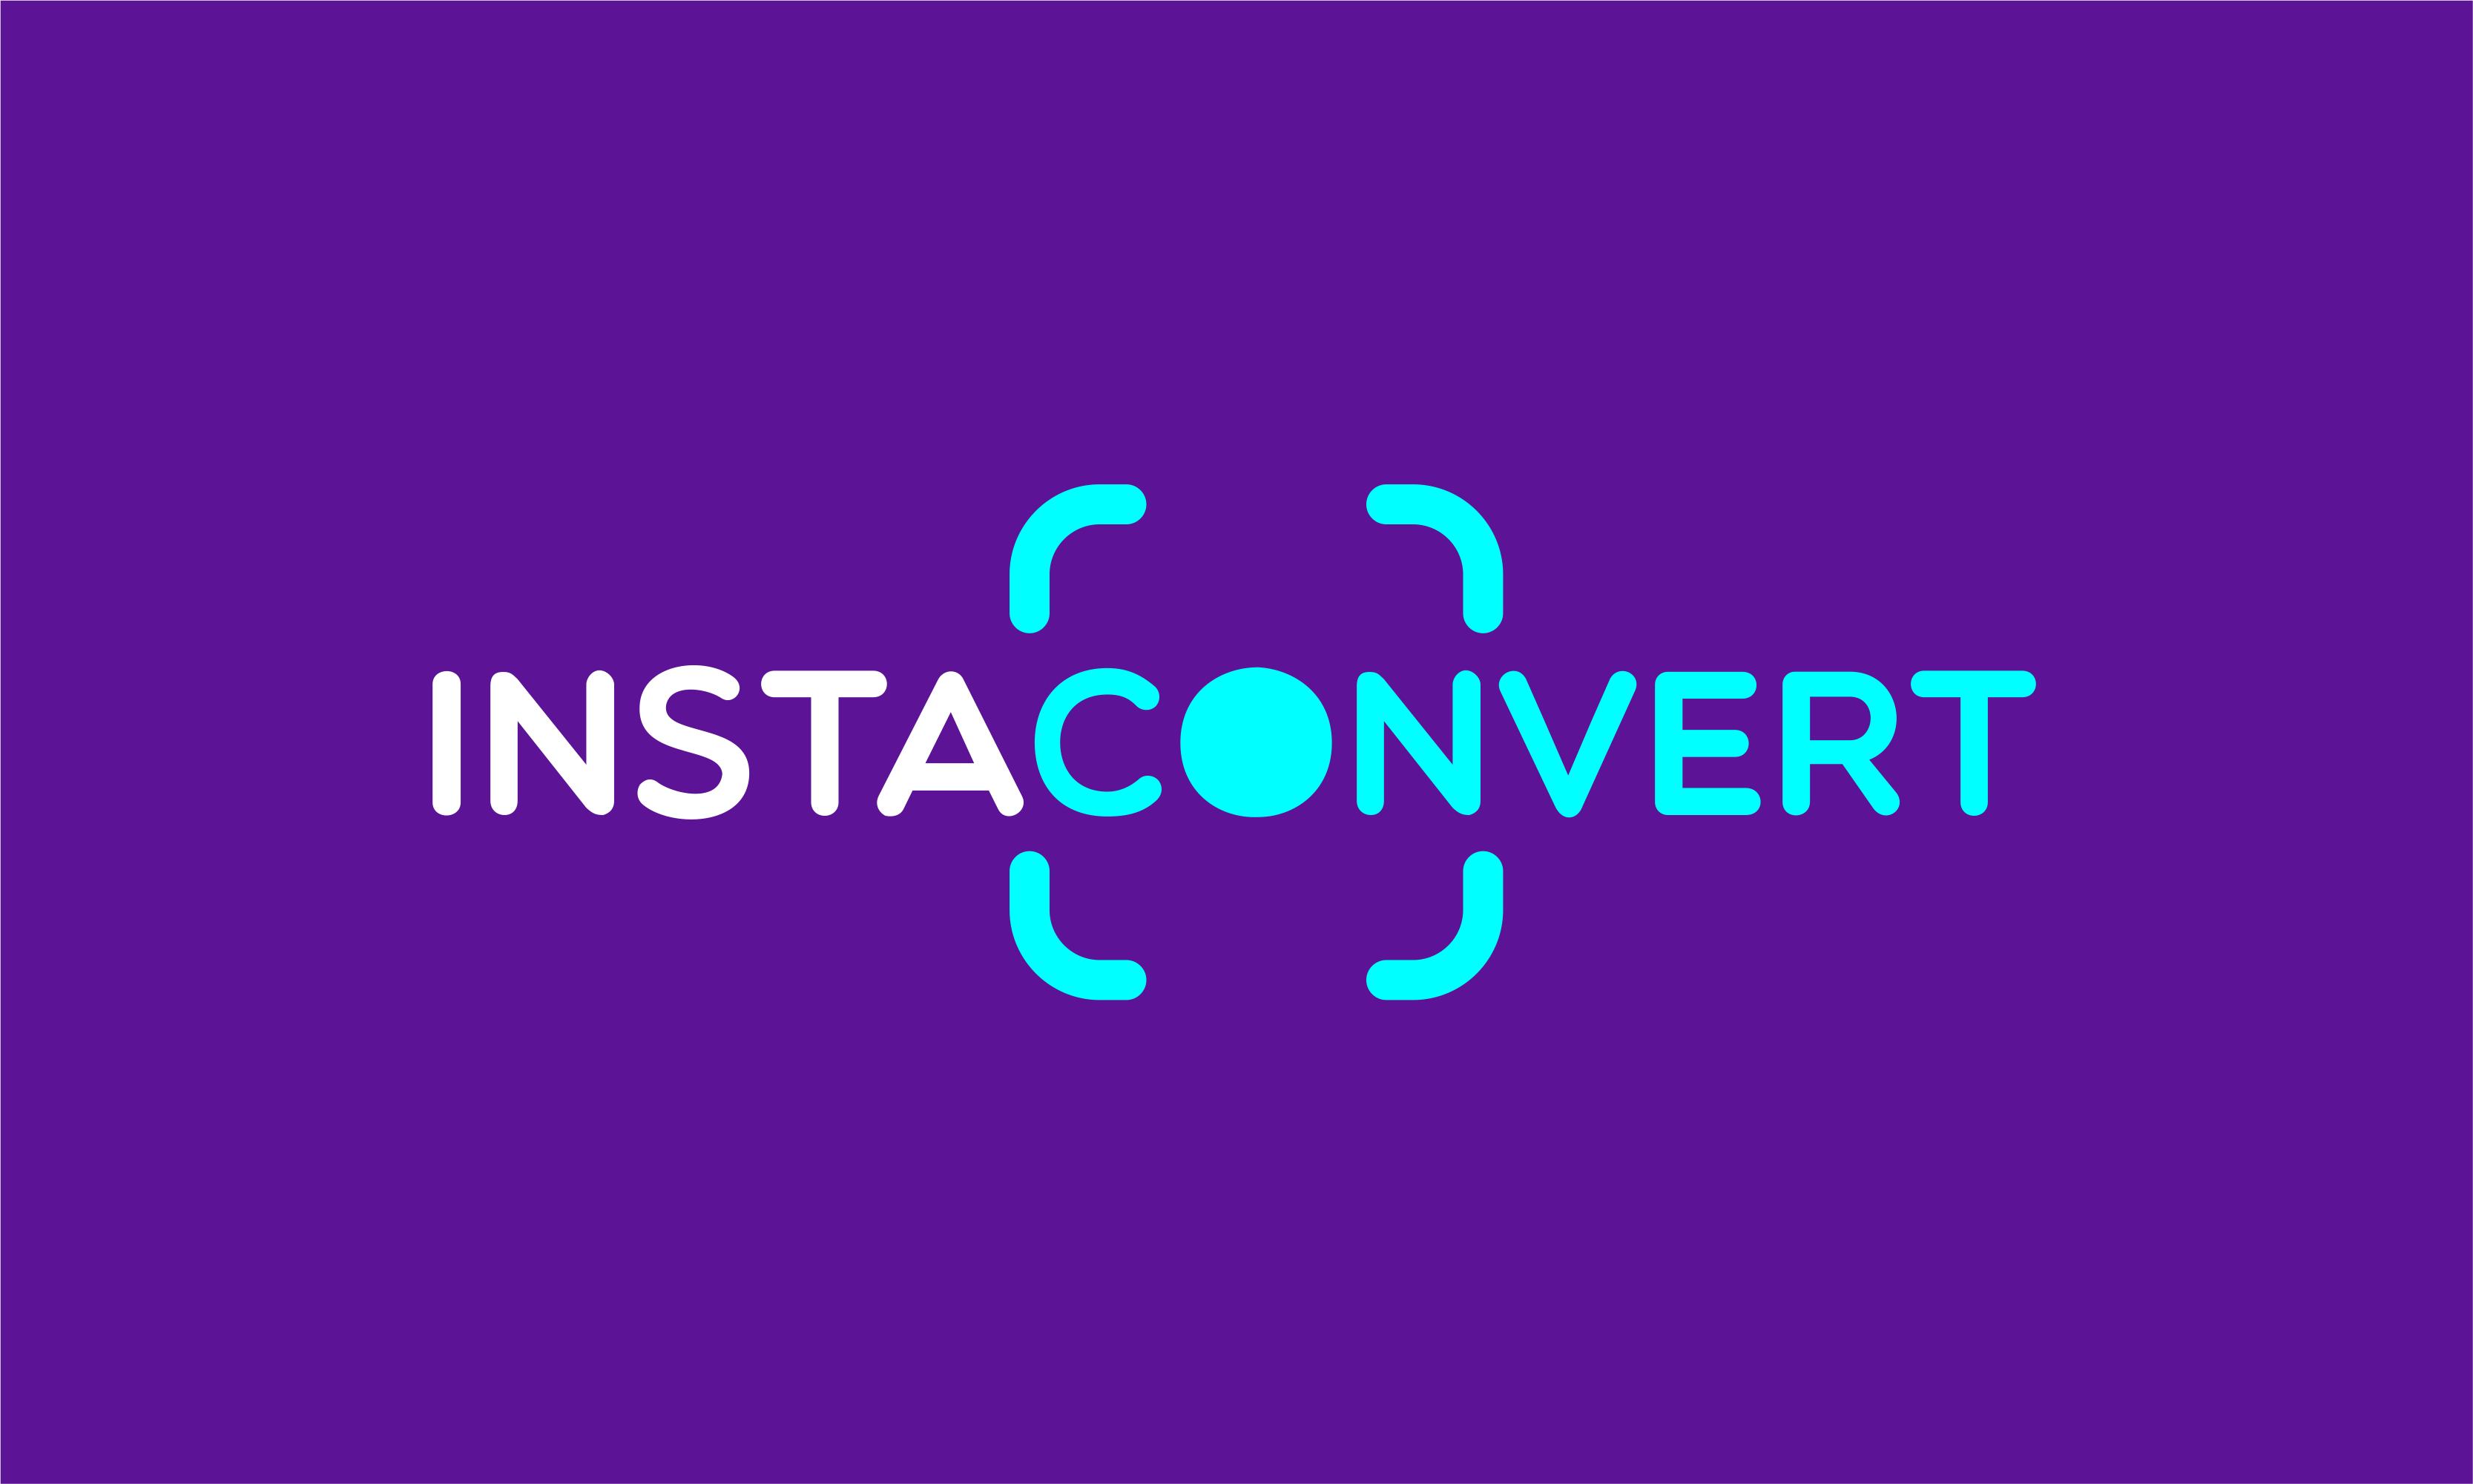 Instaconvert